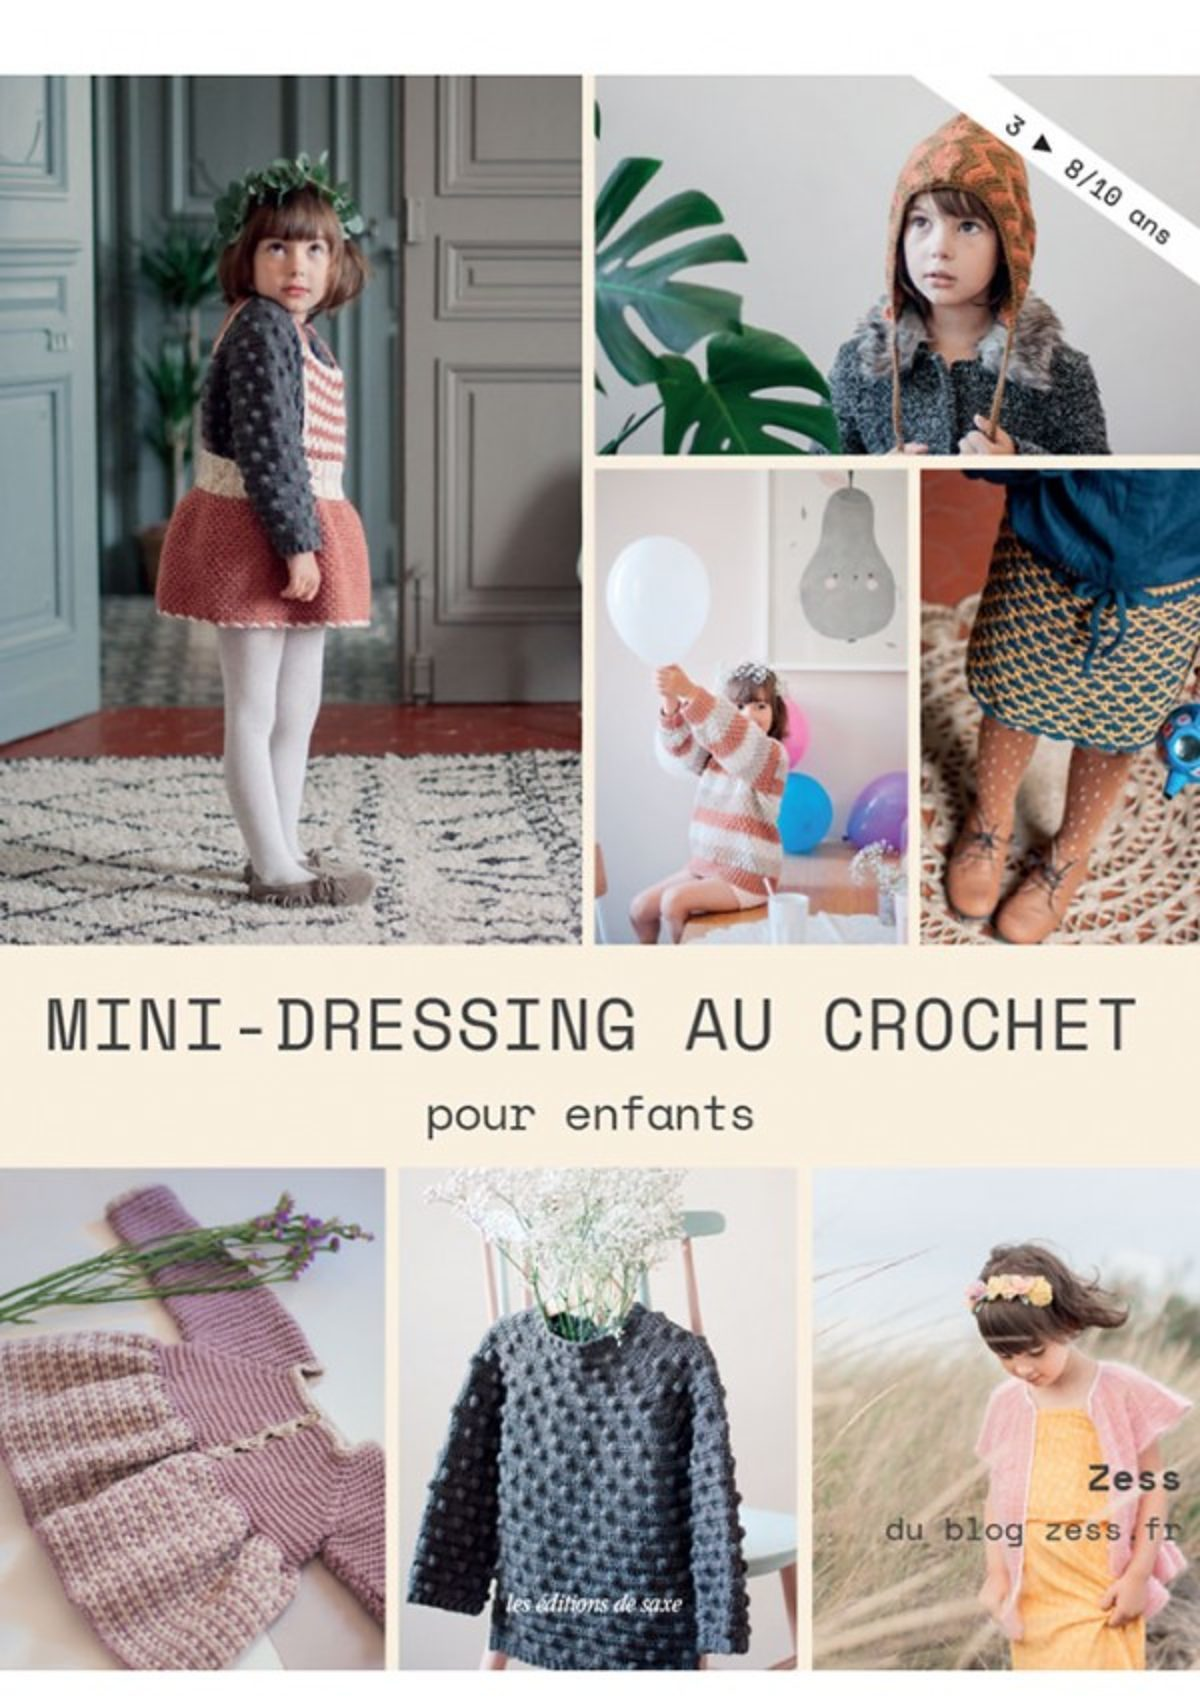 Mini-dressing au crochet pour enfants b9653eabfd7